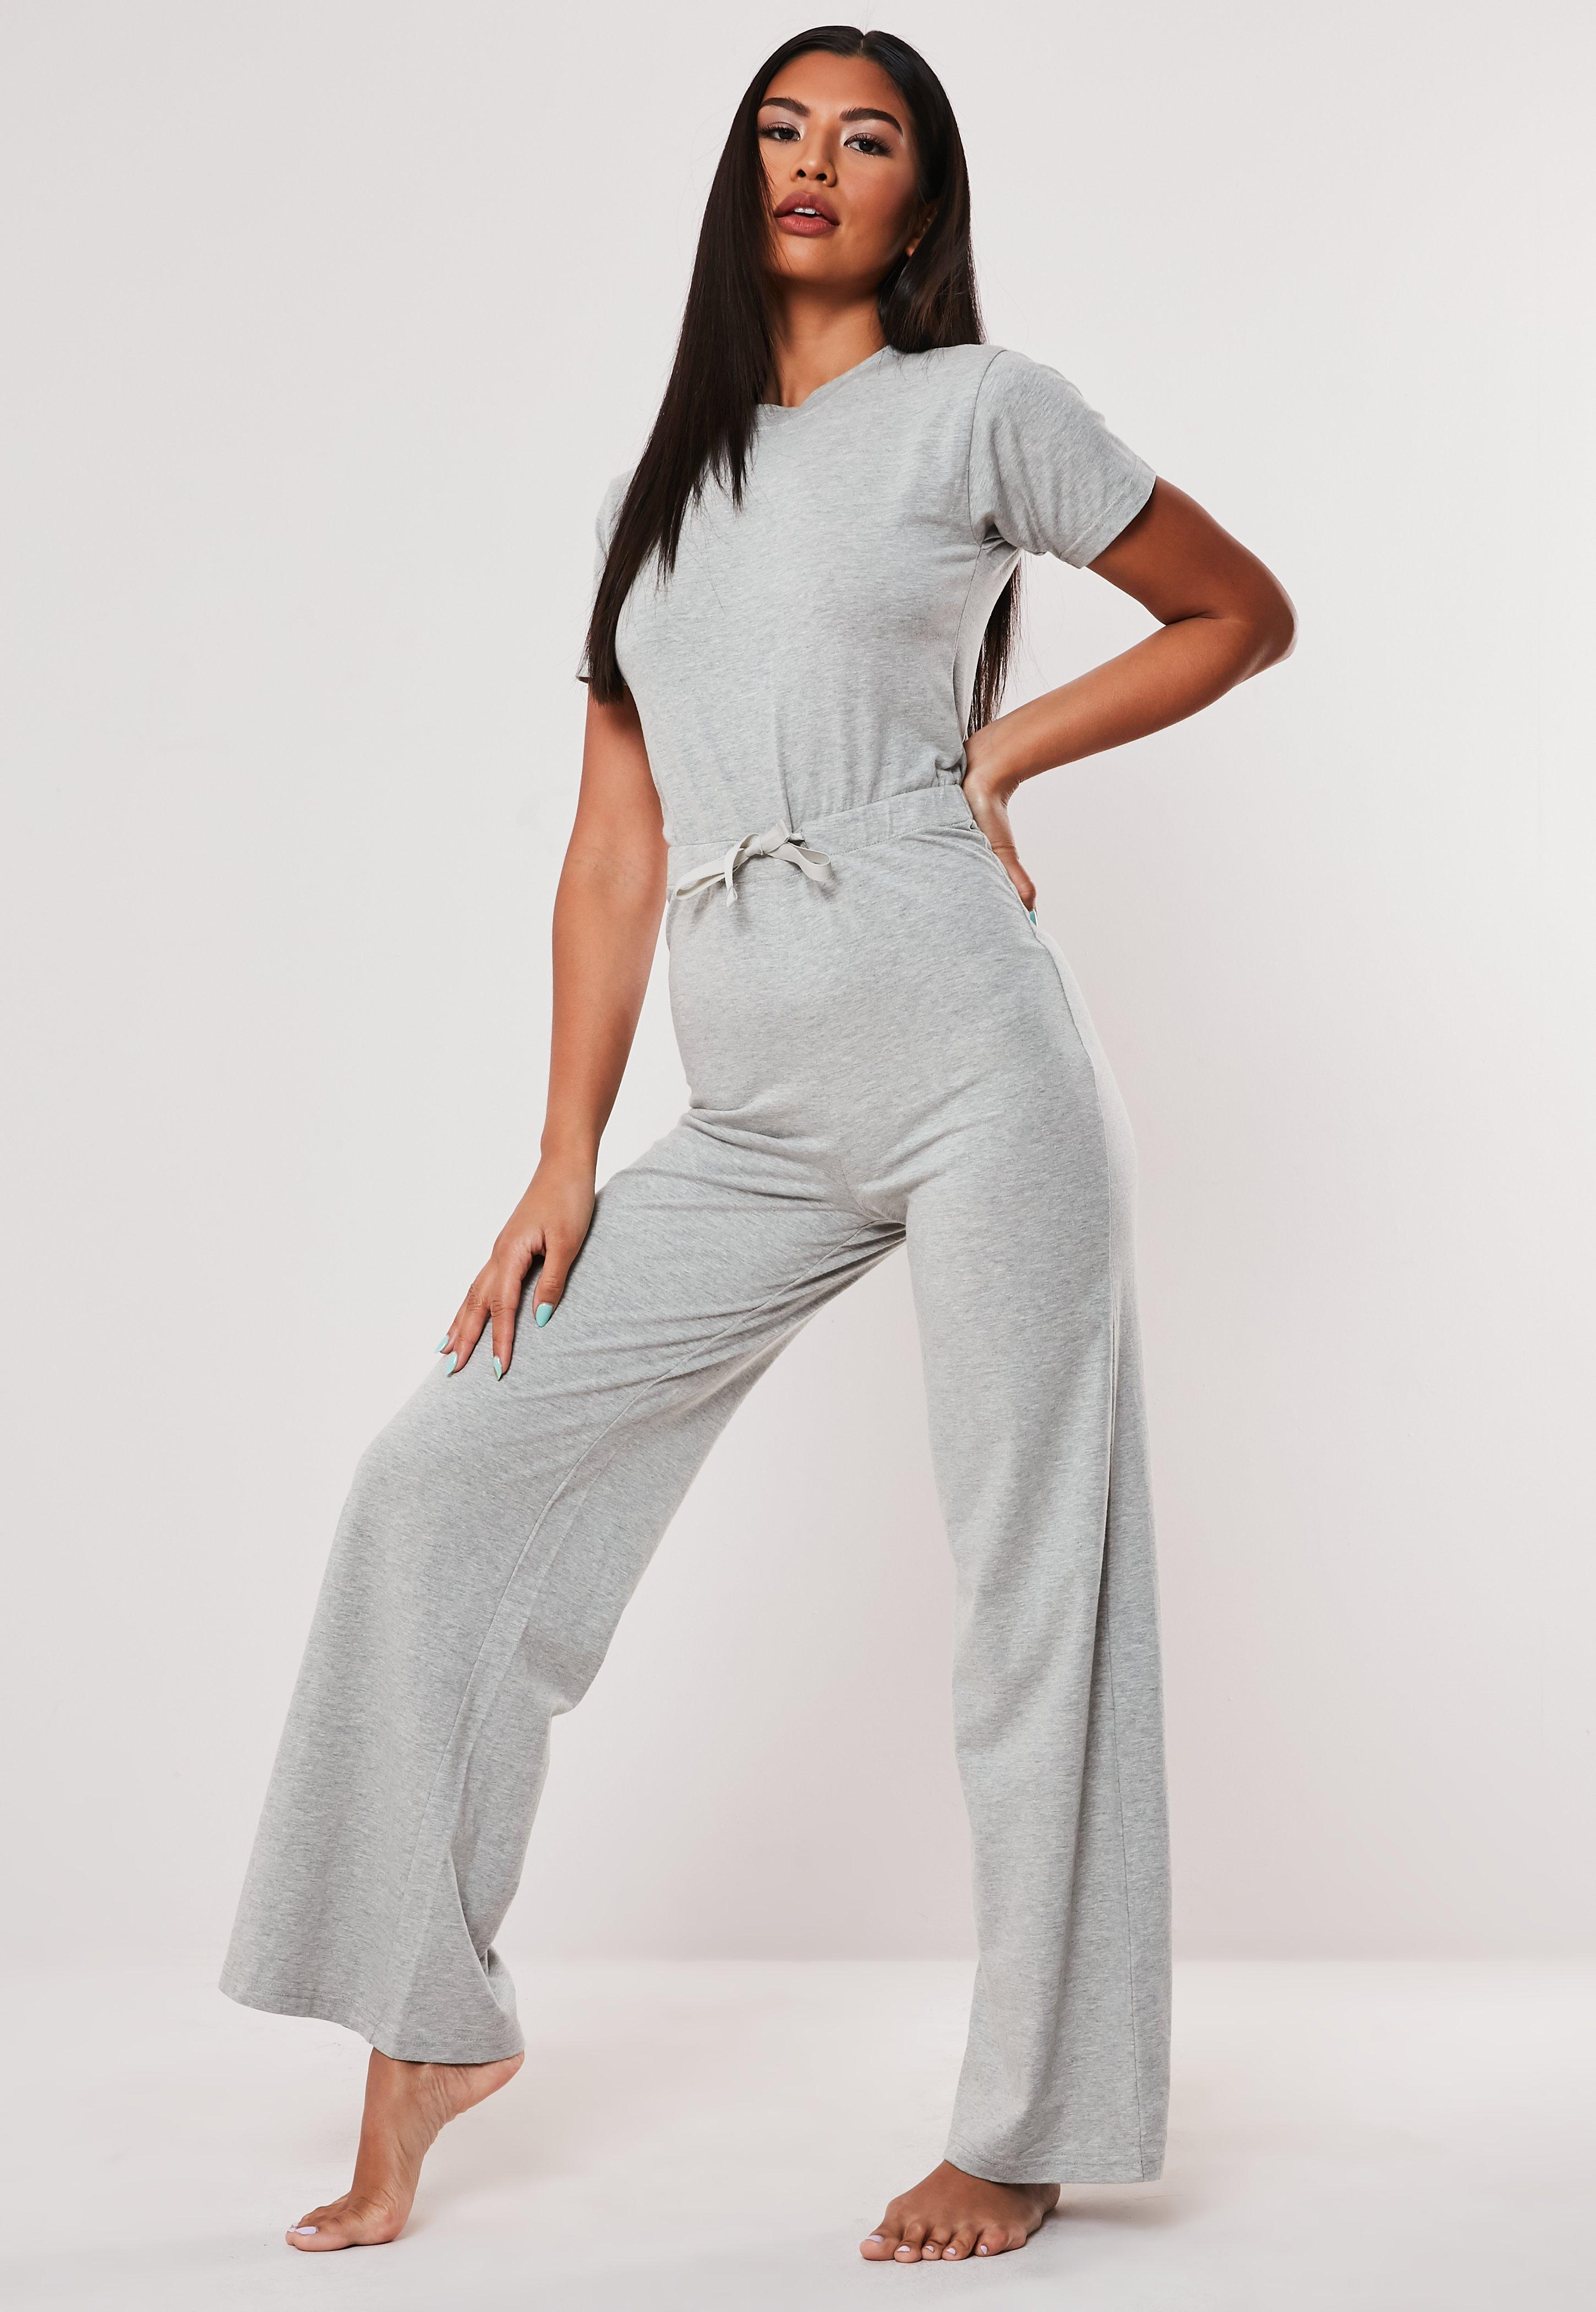 Women/'s Ladies Plain Casual Loungewear Plus Size Tracksuit Top /& Bottom Trouser